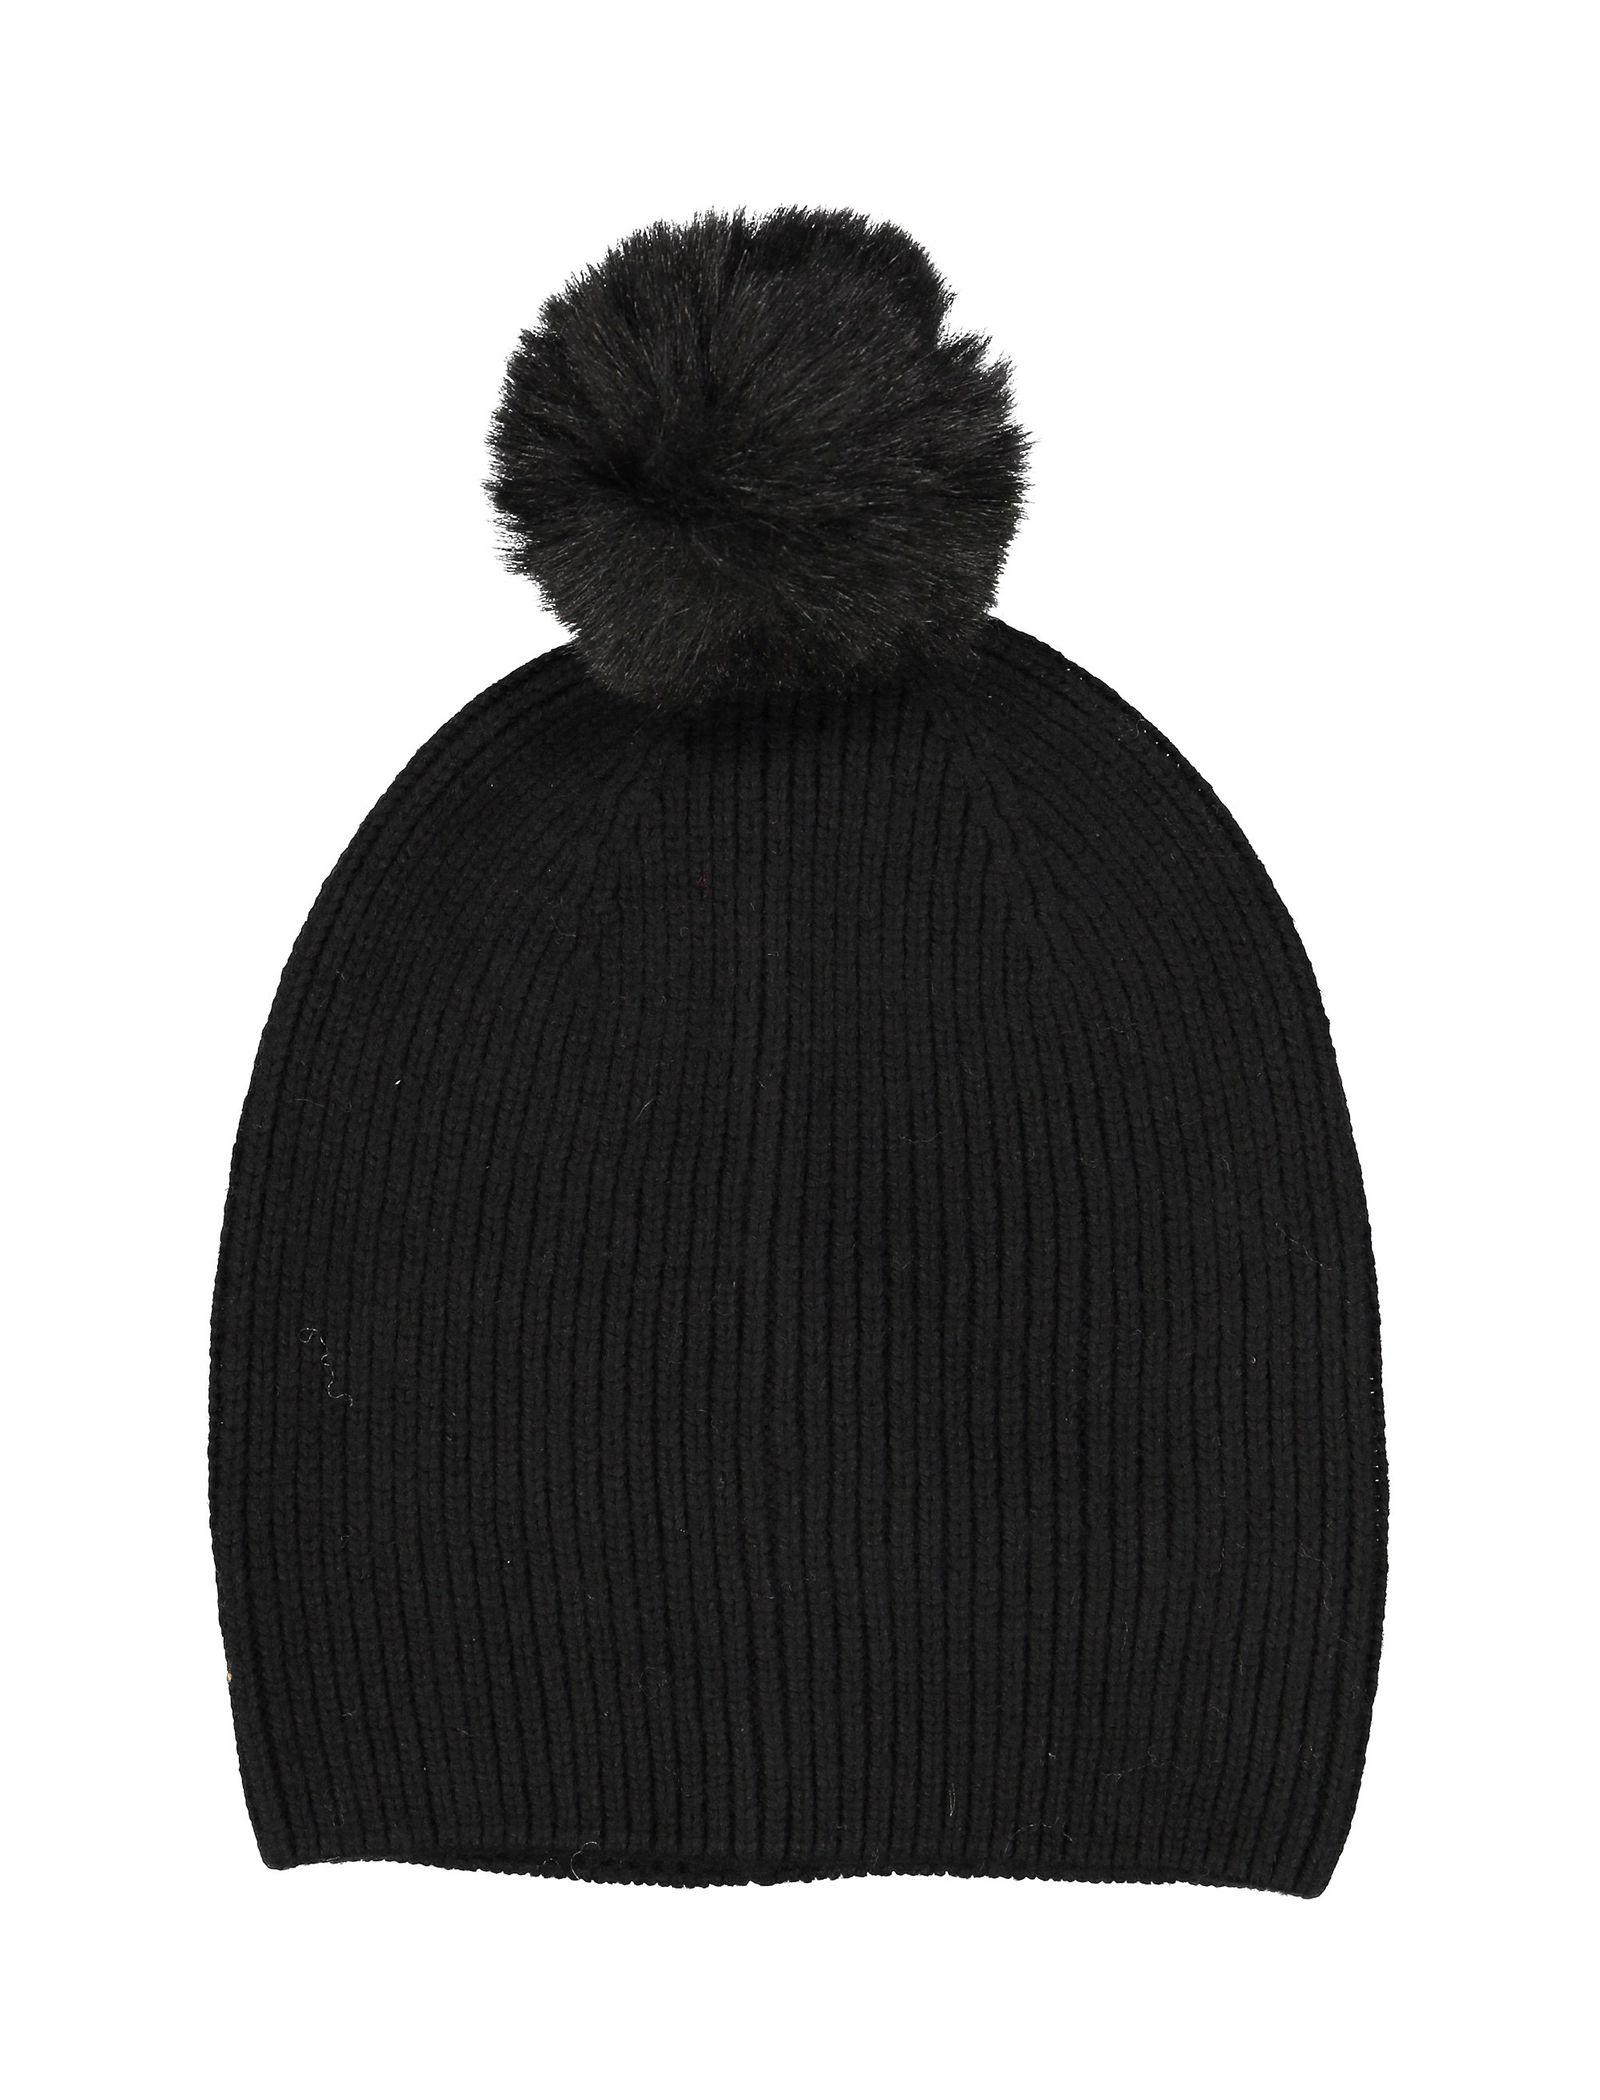 کلاه بافتنی زنانه - پی سز - مشکي   - 1